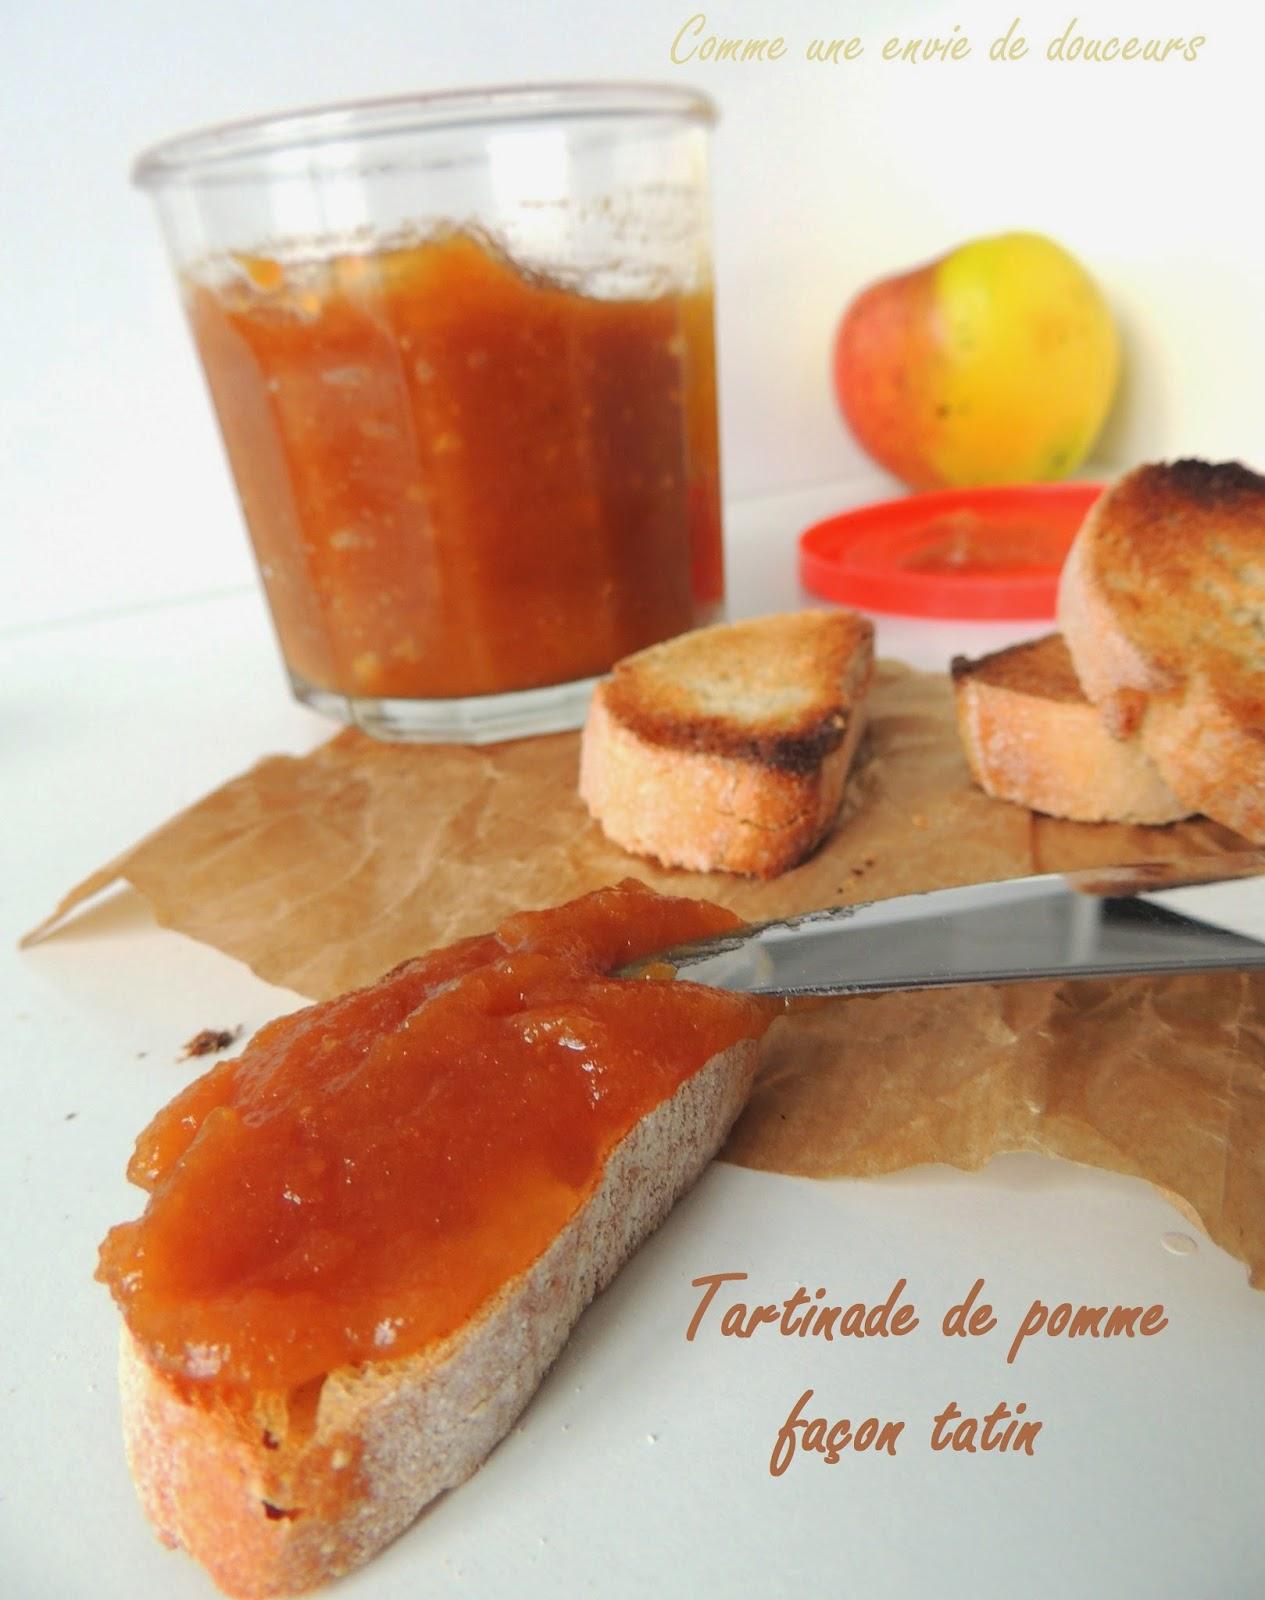 http://commeuneenviededouceurs.blogspot.fr/2014/11/tartinade-de-pommes-facon-tatin-apple.html